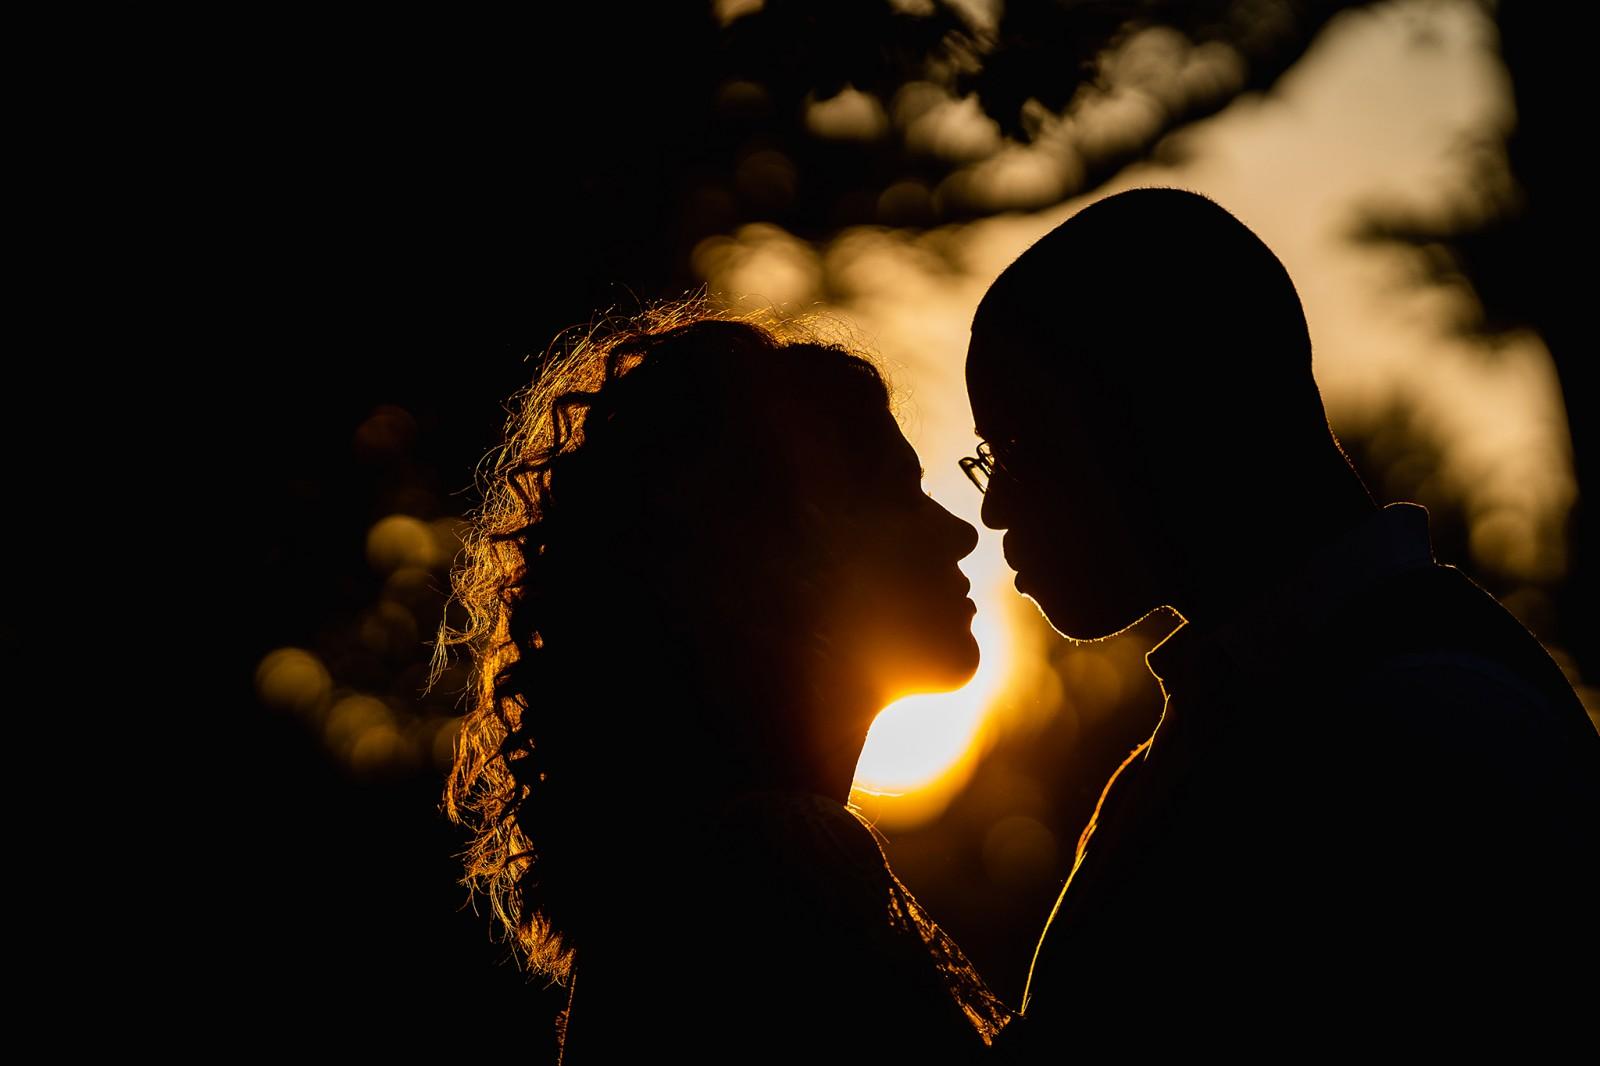 Silhouet - loveshoot